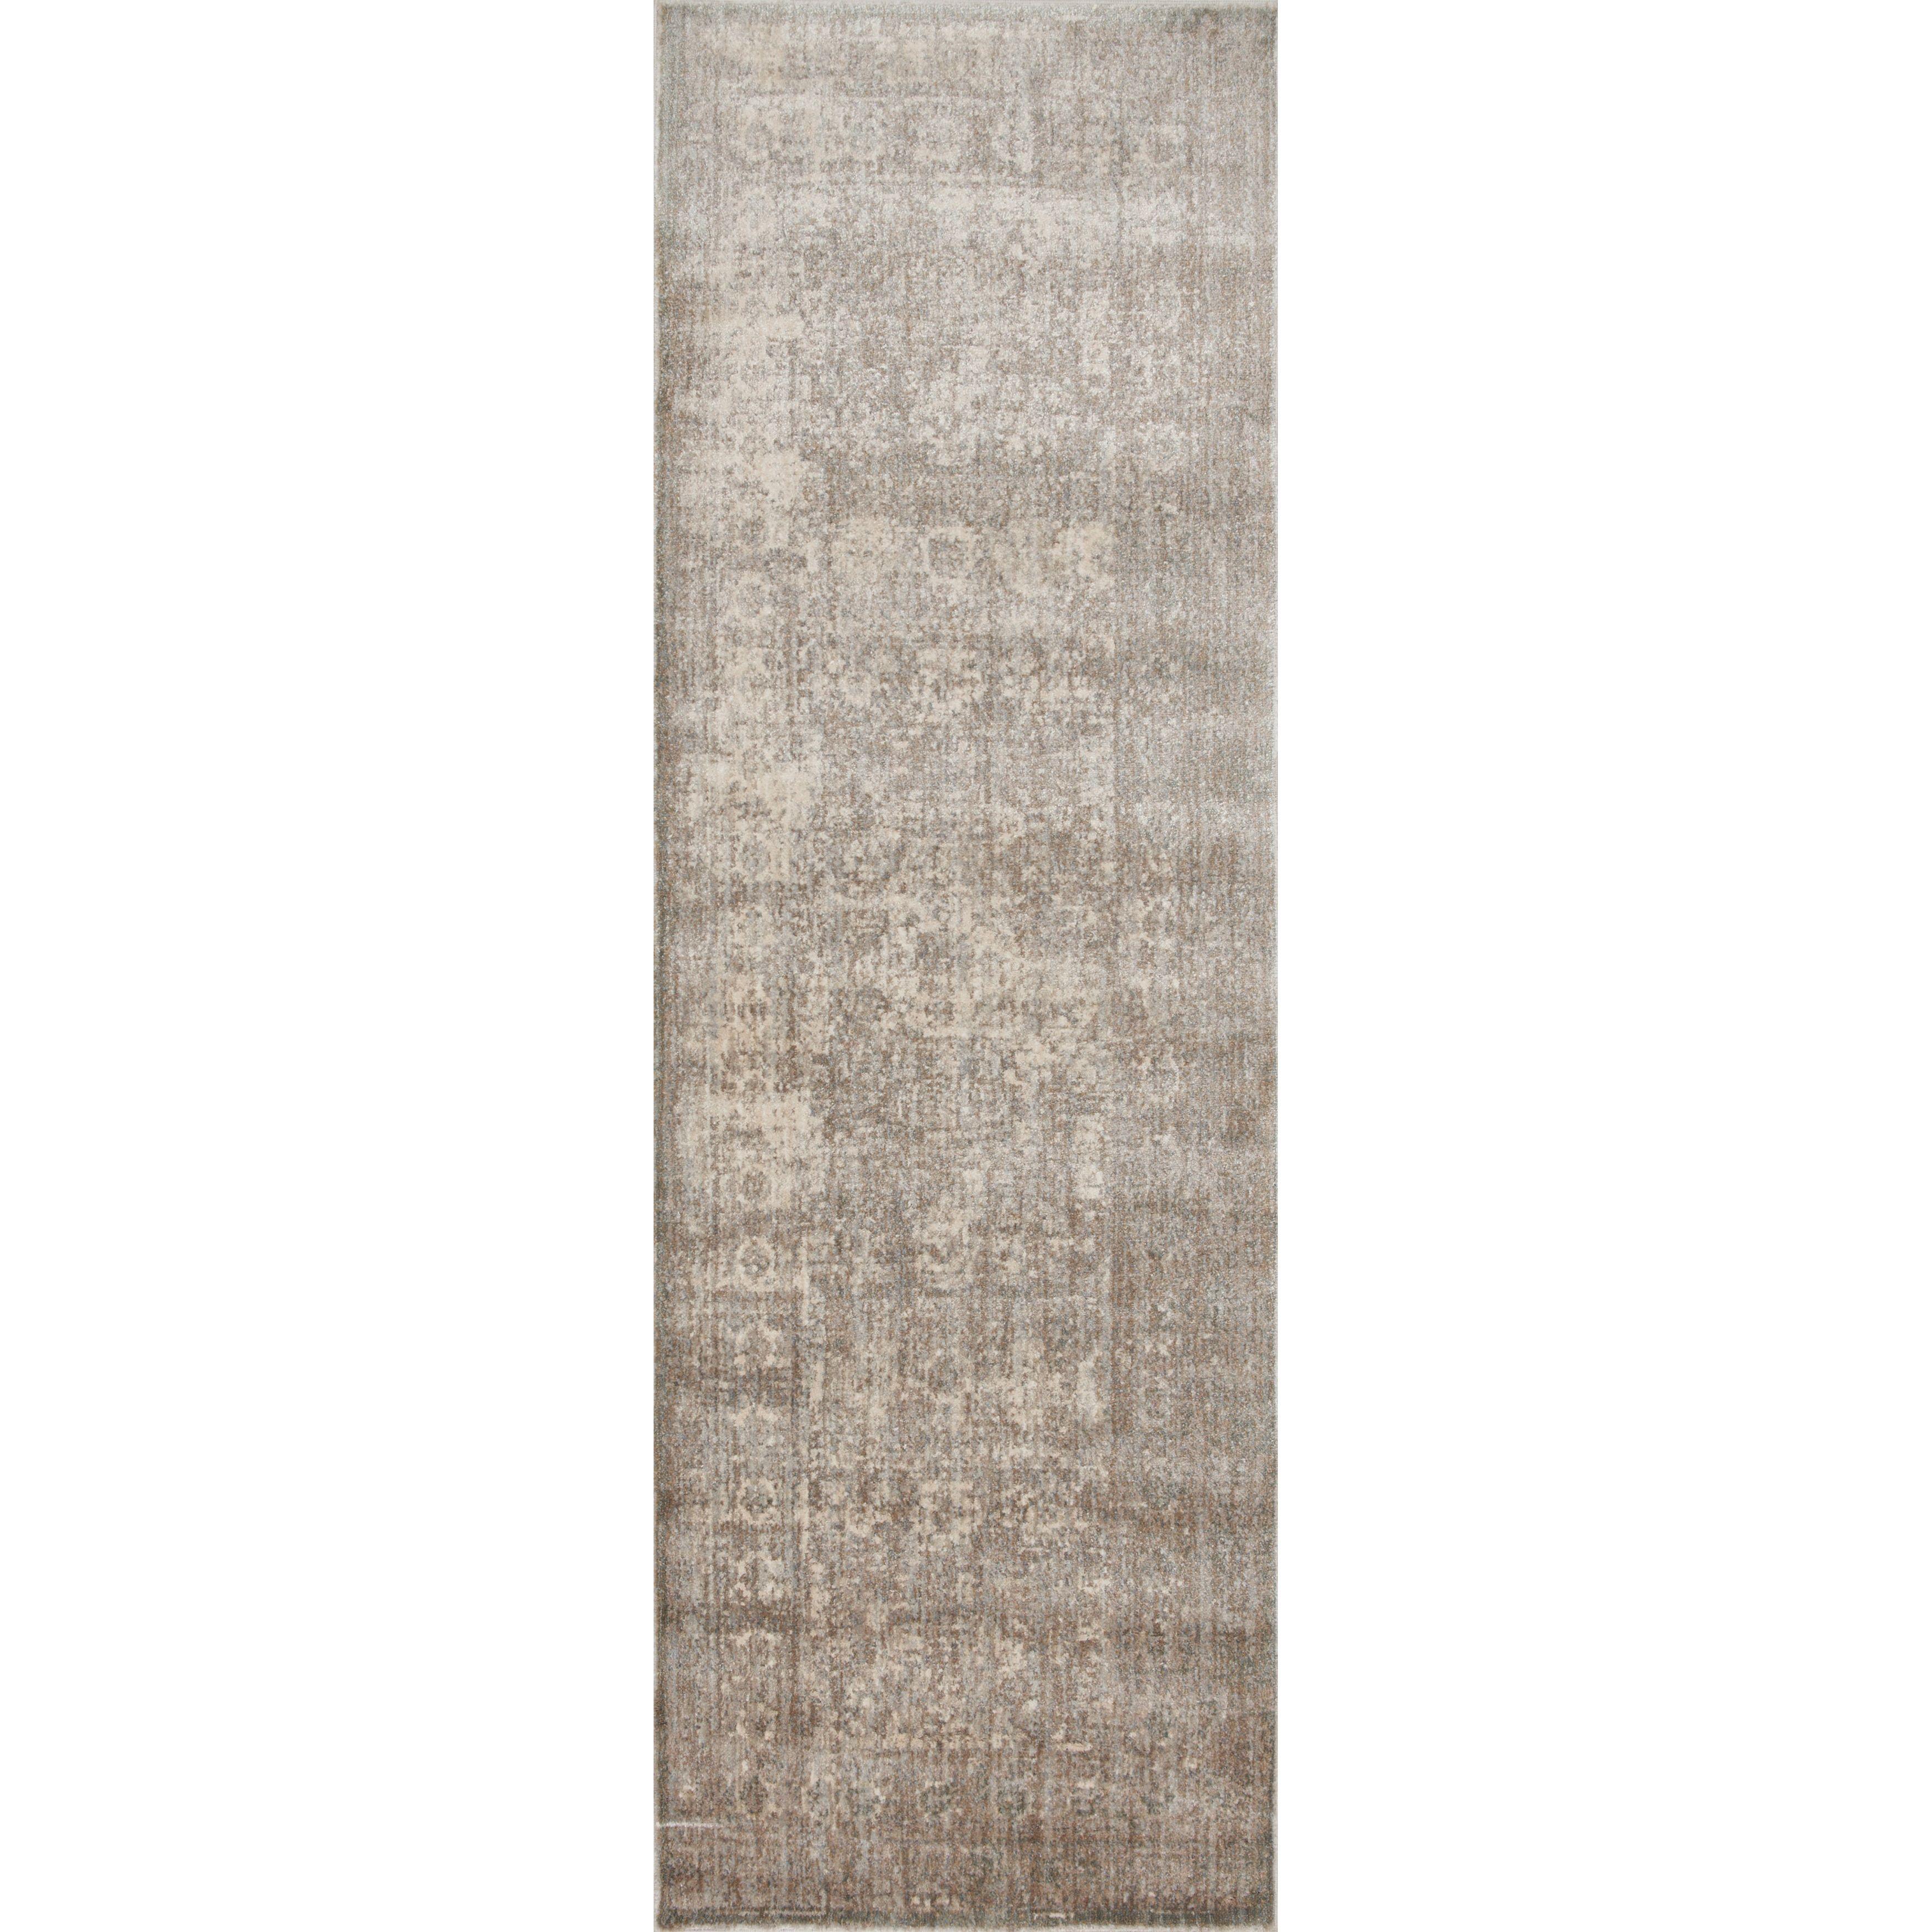 Alexander Home Contessa Grey/ Sage Runner Rug (2'7 x 8') (Grey/ Sage (2'7 x 8')), Size 2'7 x 8' (Polyester, Abstract)